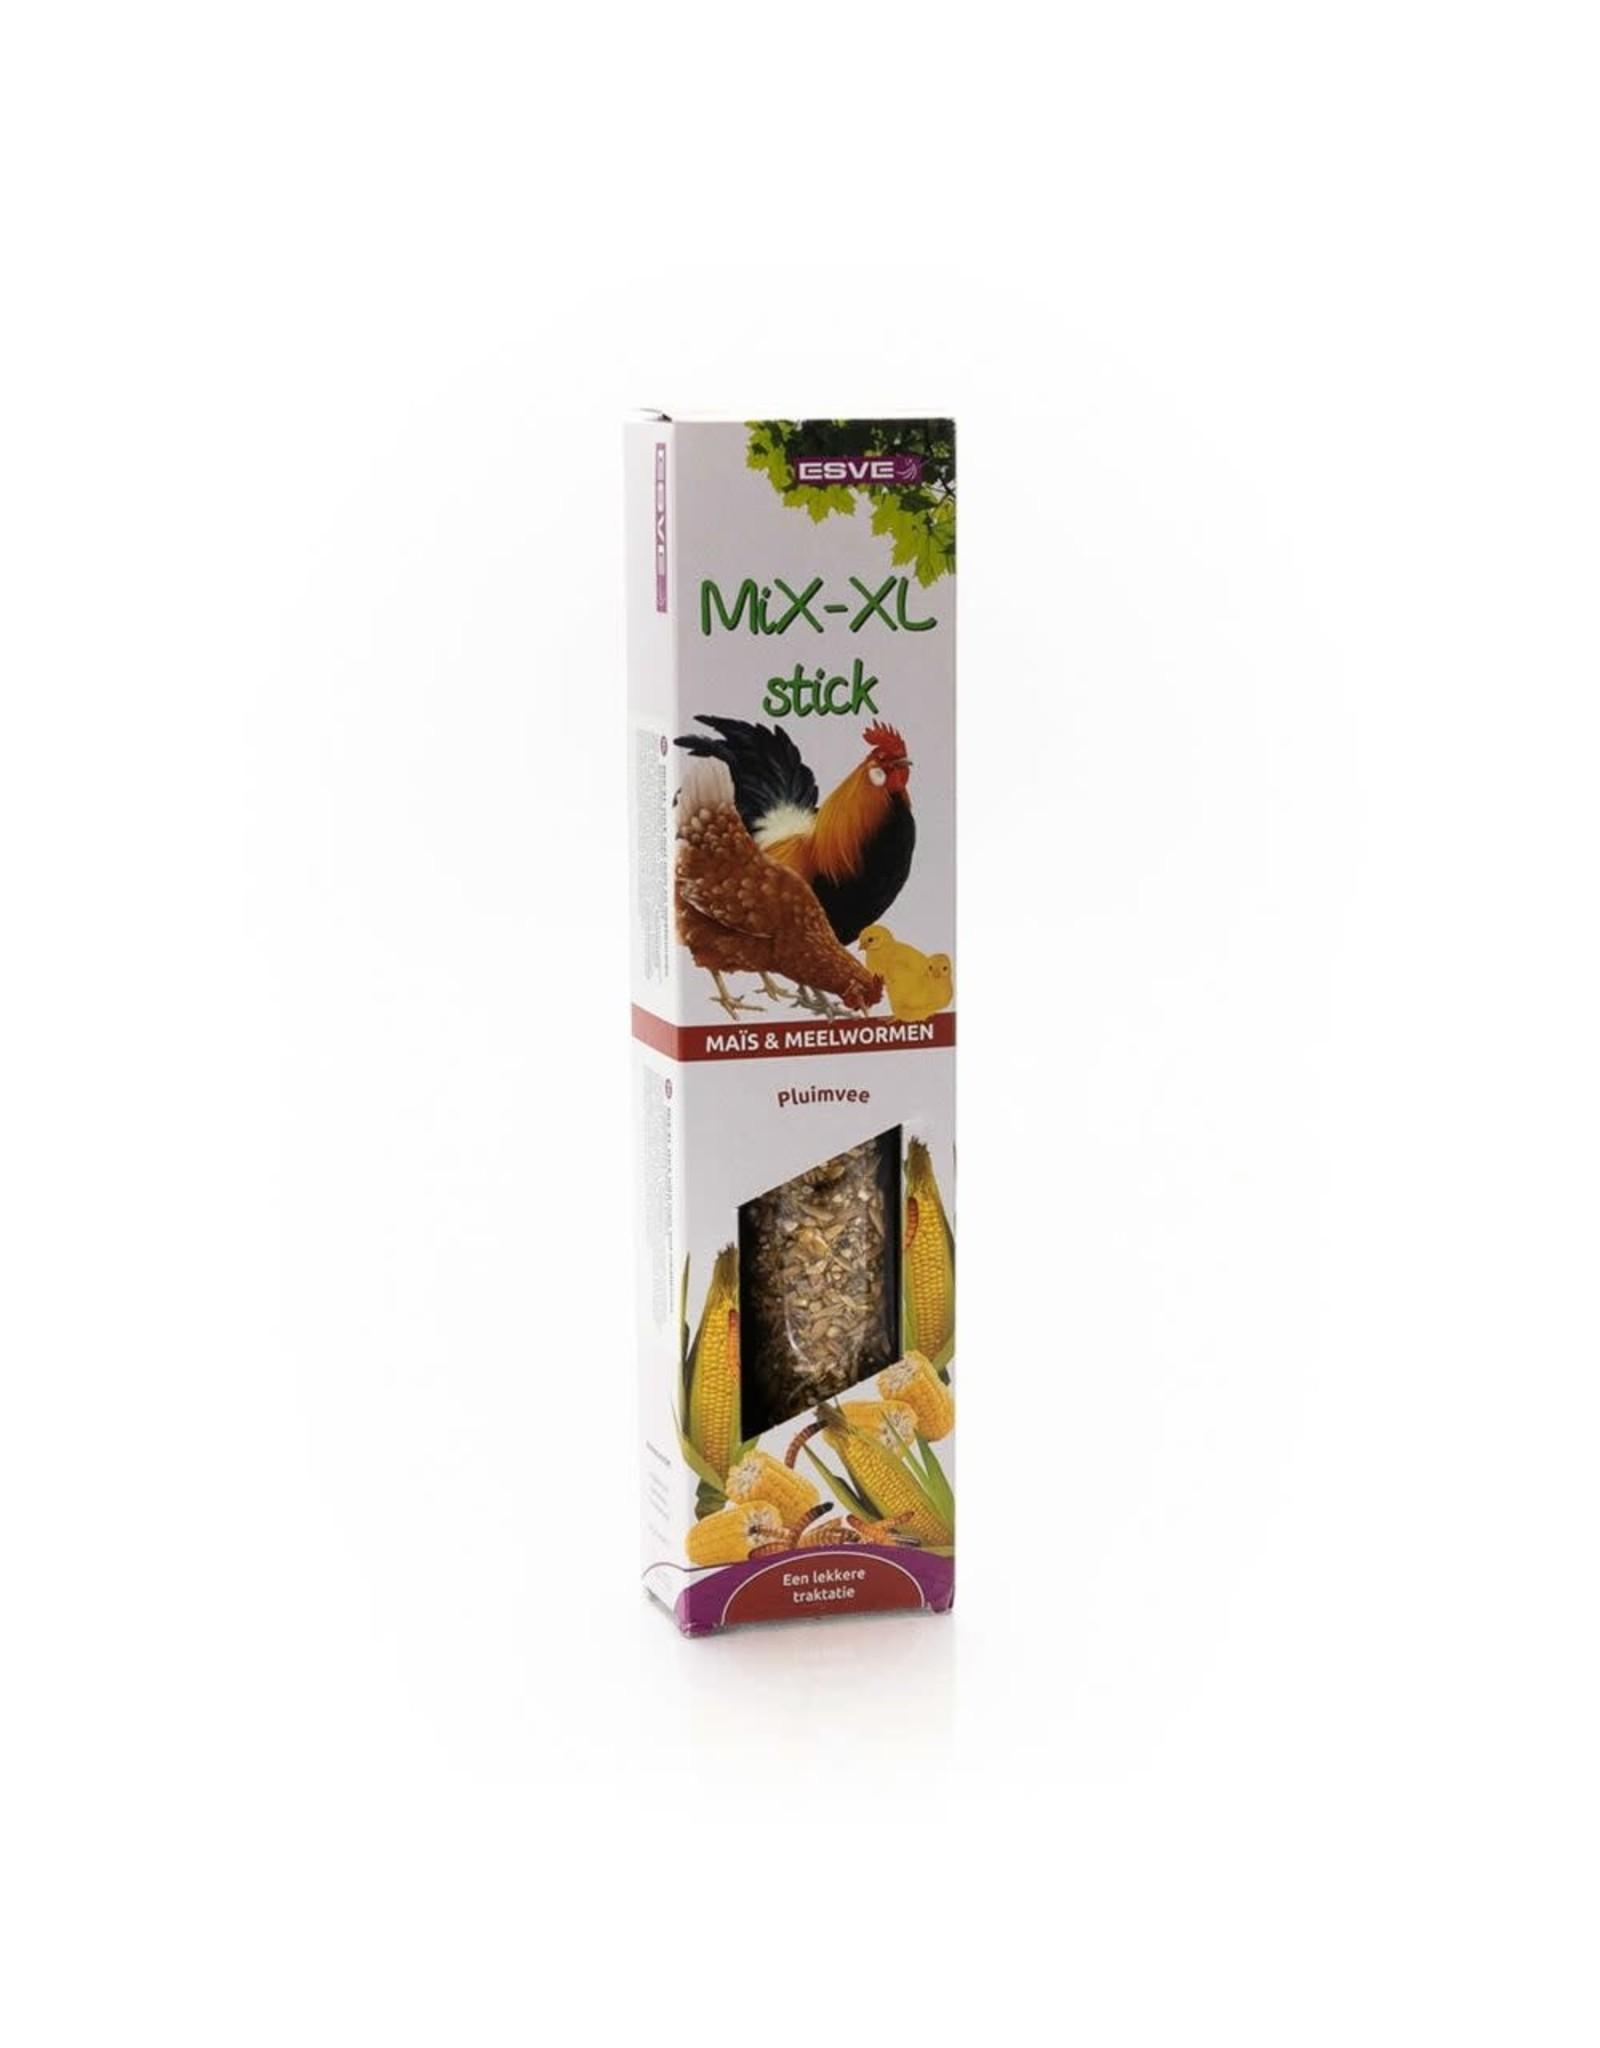 Esve Mix XL stick Kippen Mais Meelwormen